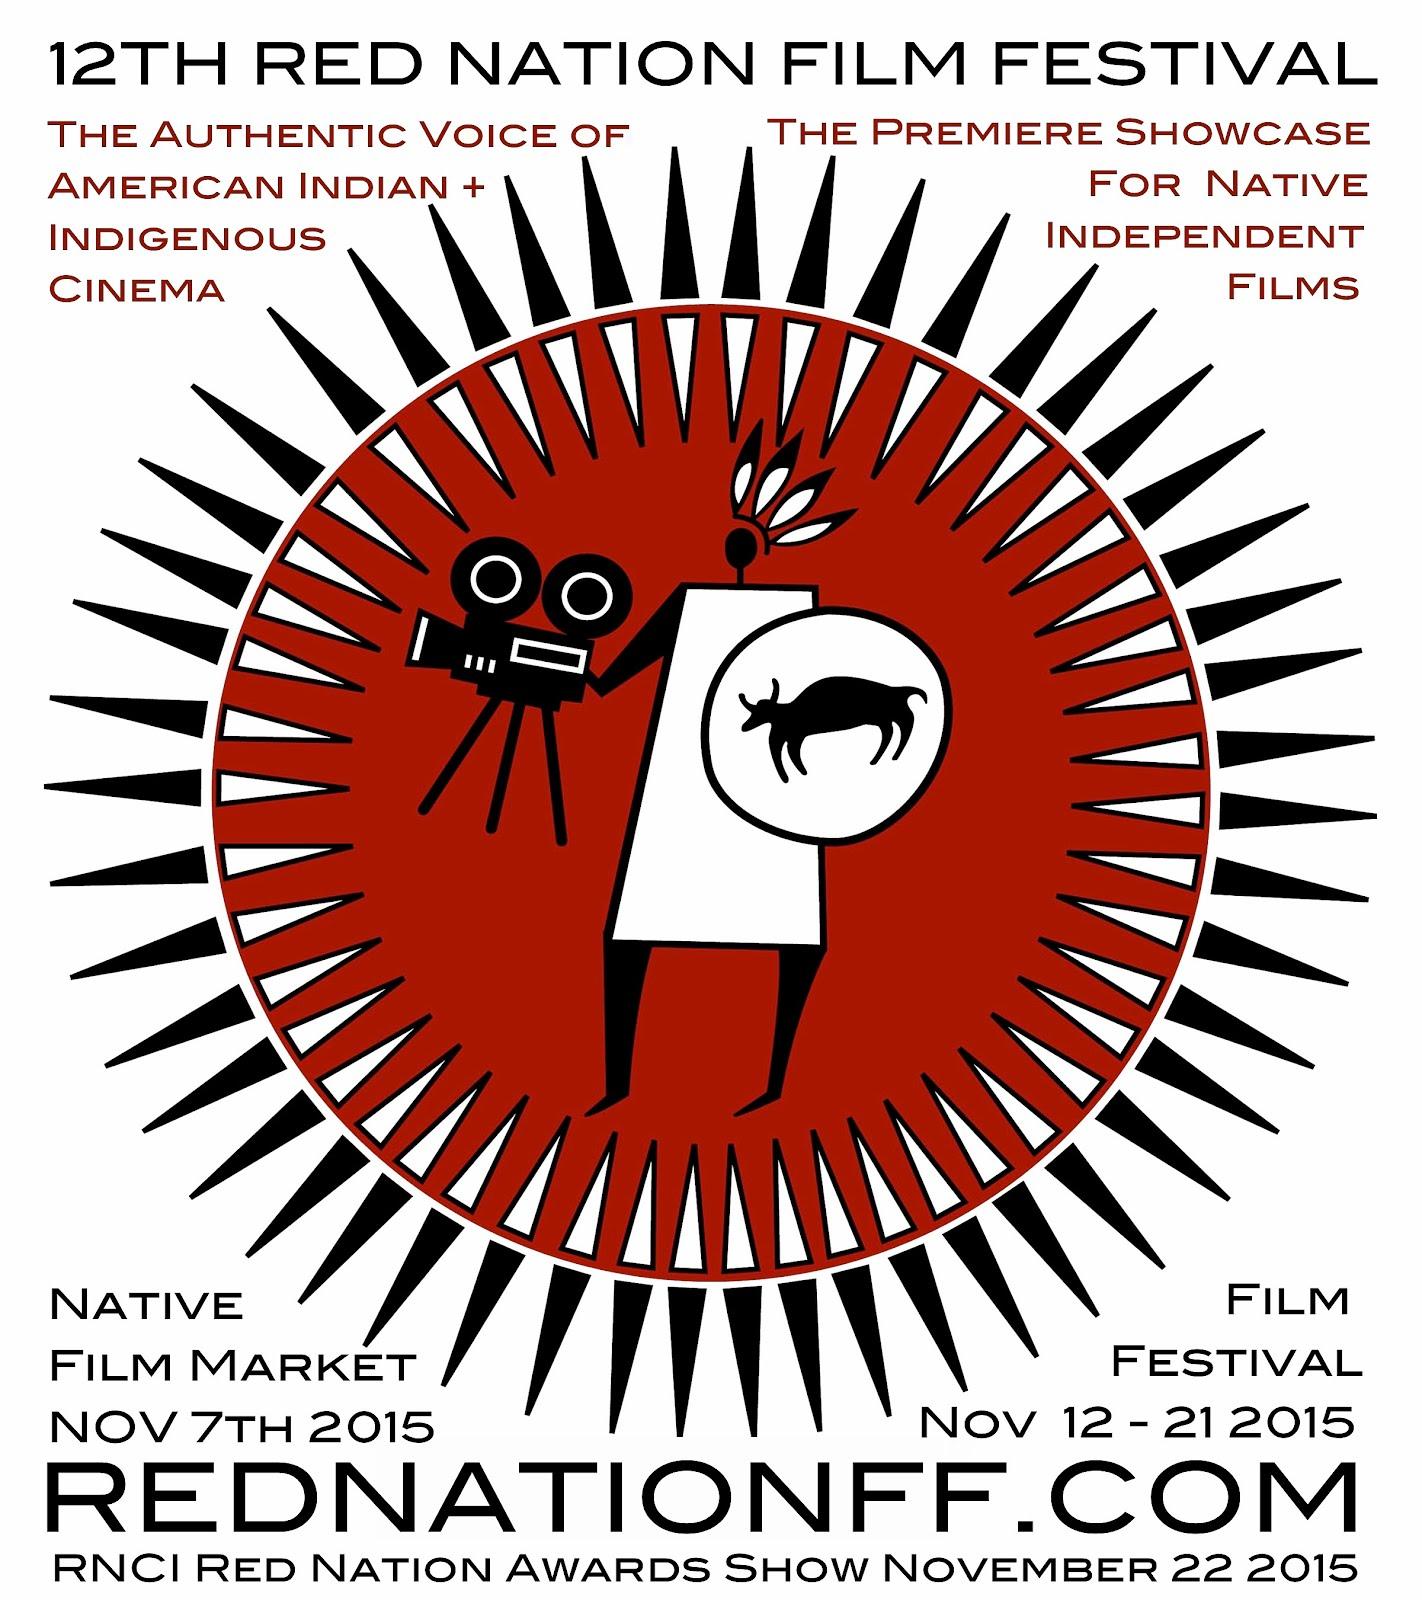 RED NATION FILM FEST